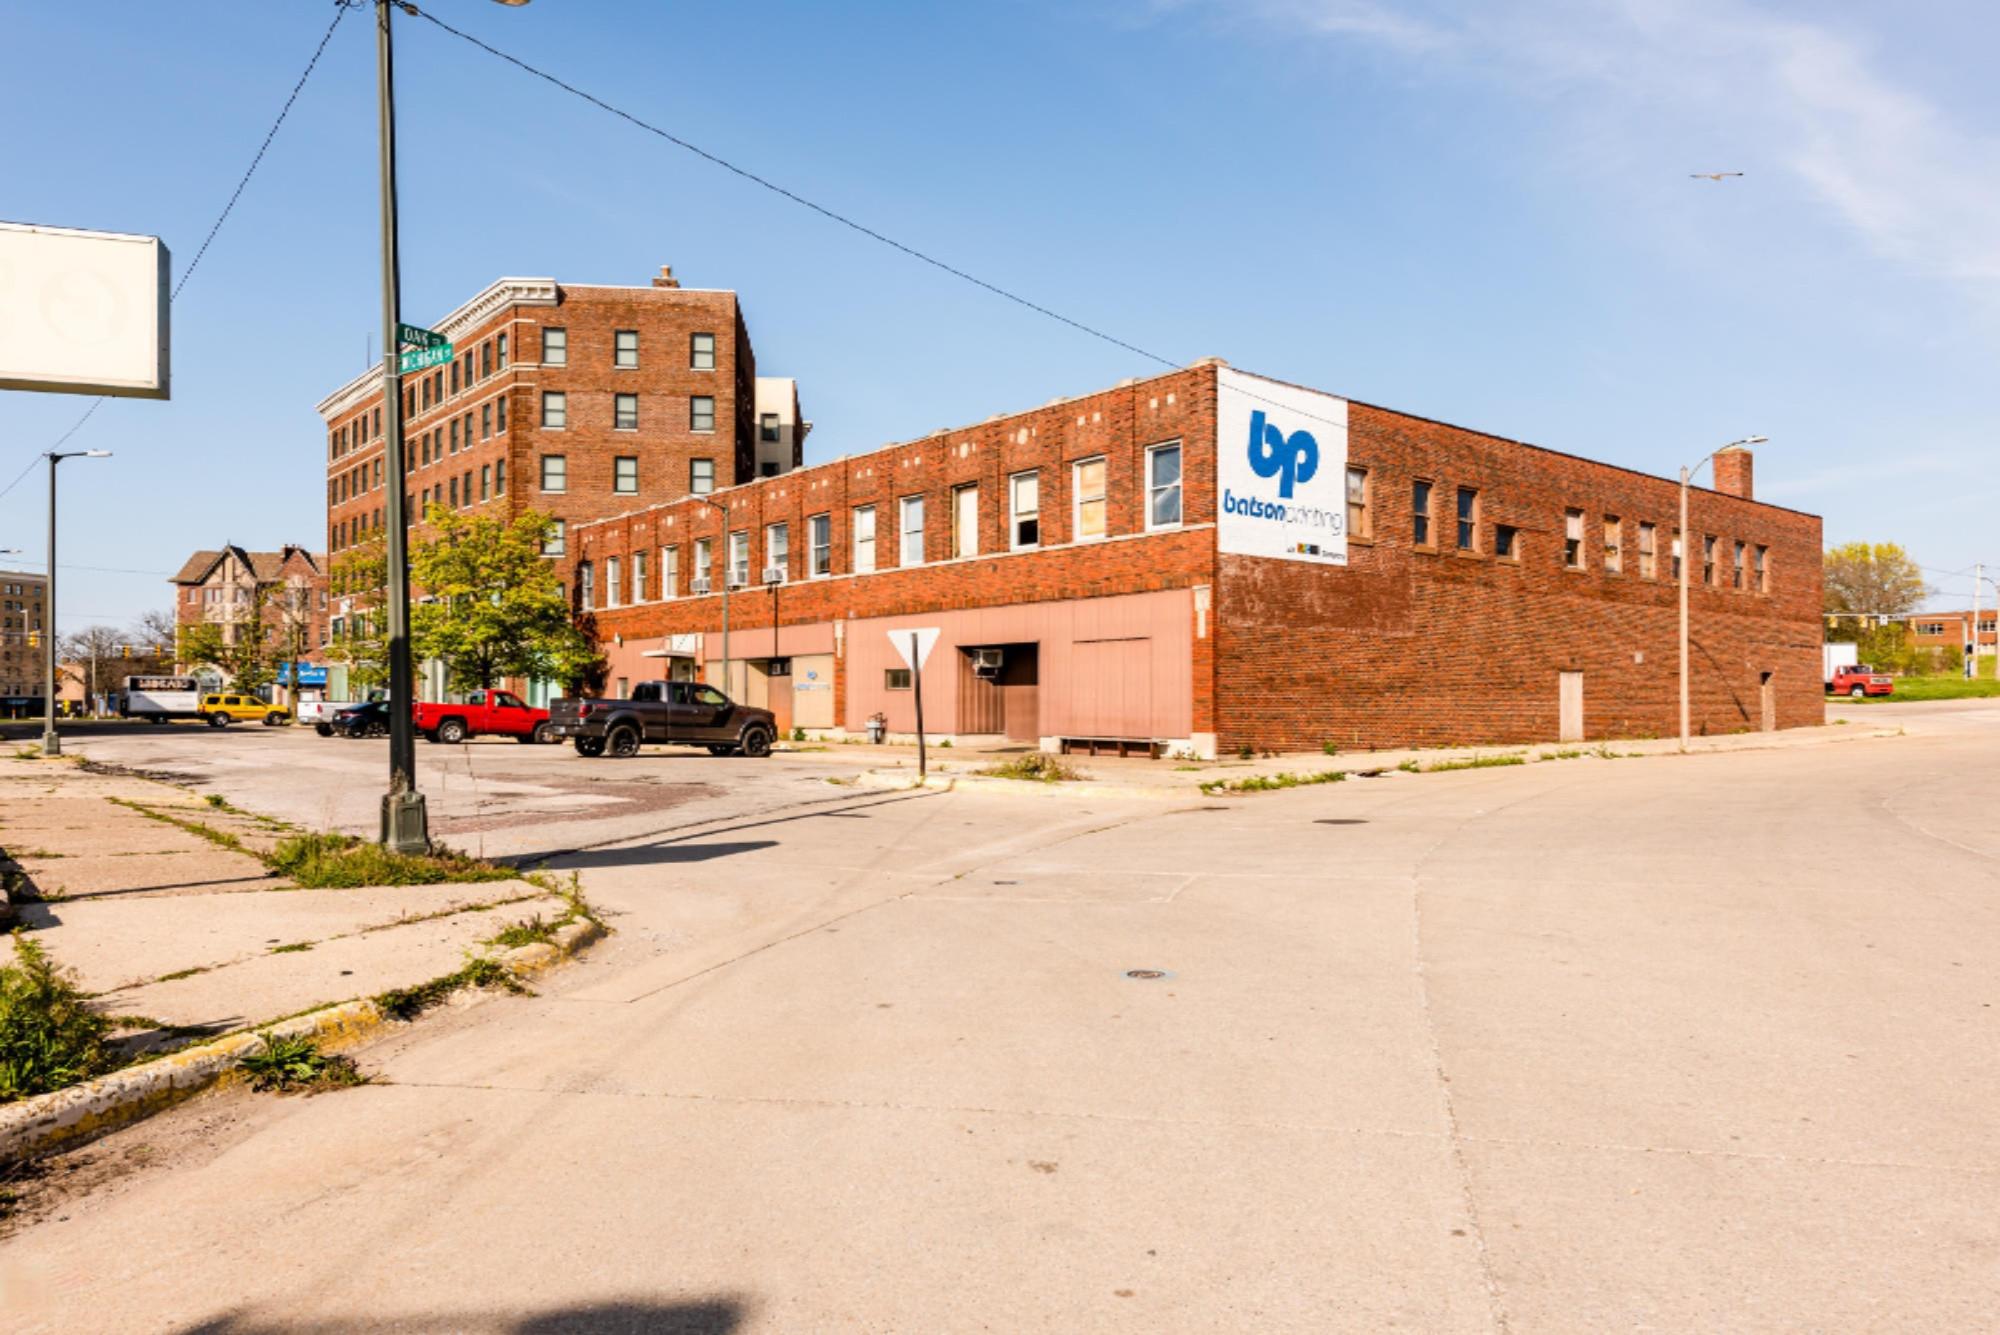 195 Michigan Street, Benton Harbor MI 49022 - Photo 1